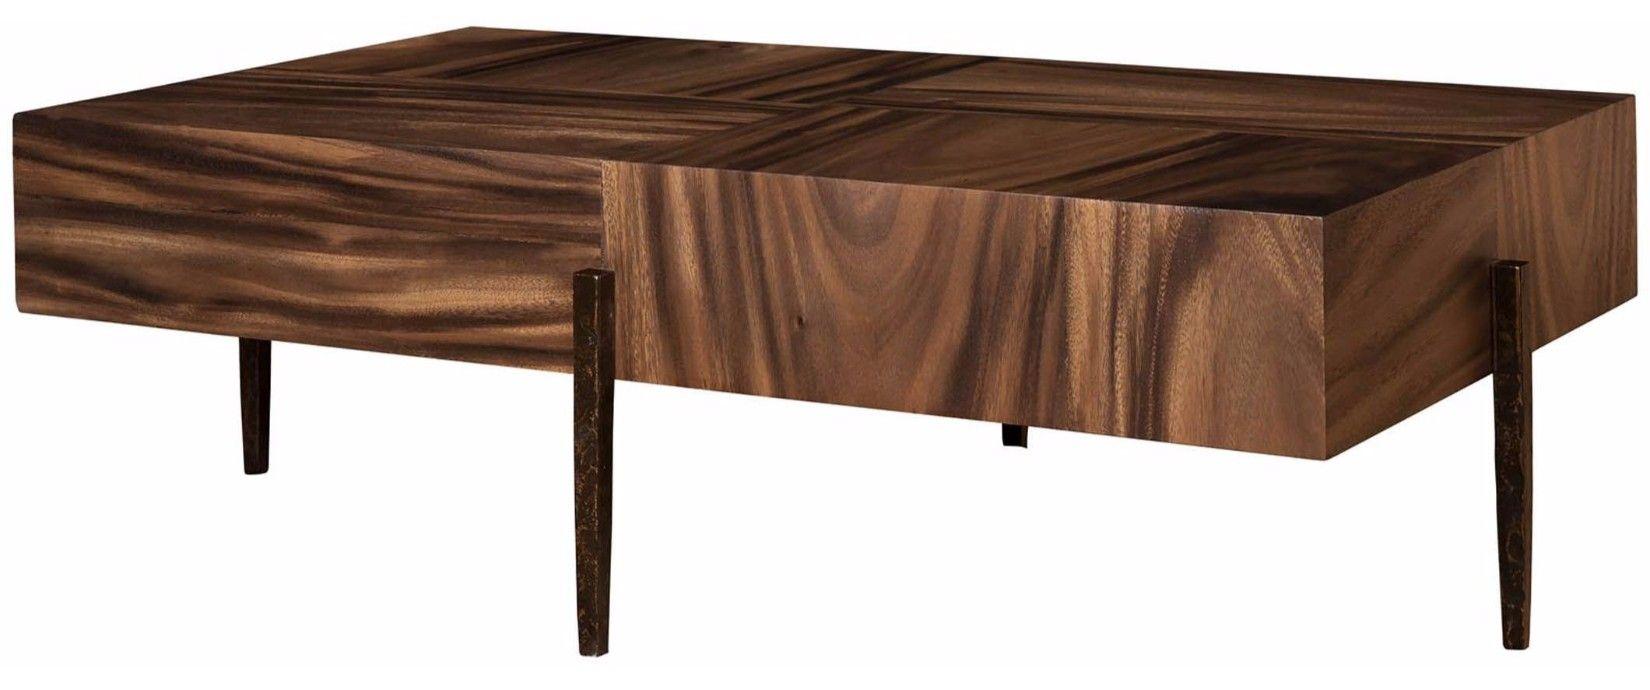 Cala Coffee Table Taracea Coffee Table Home Decor Table